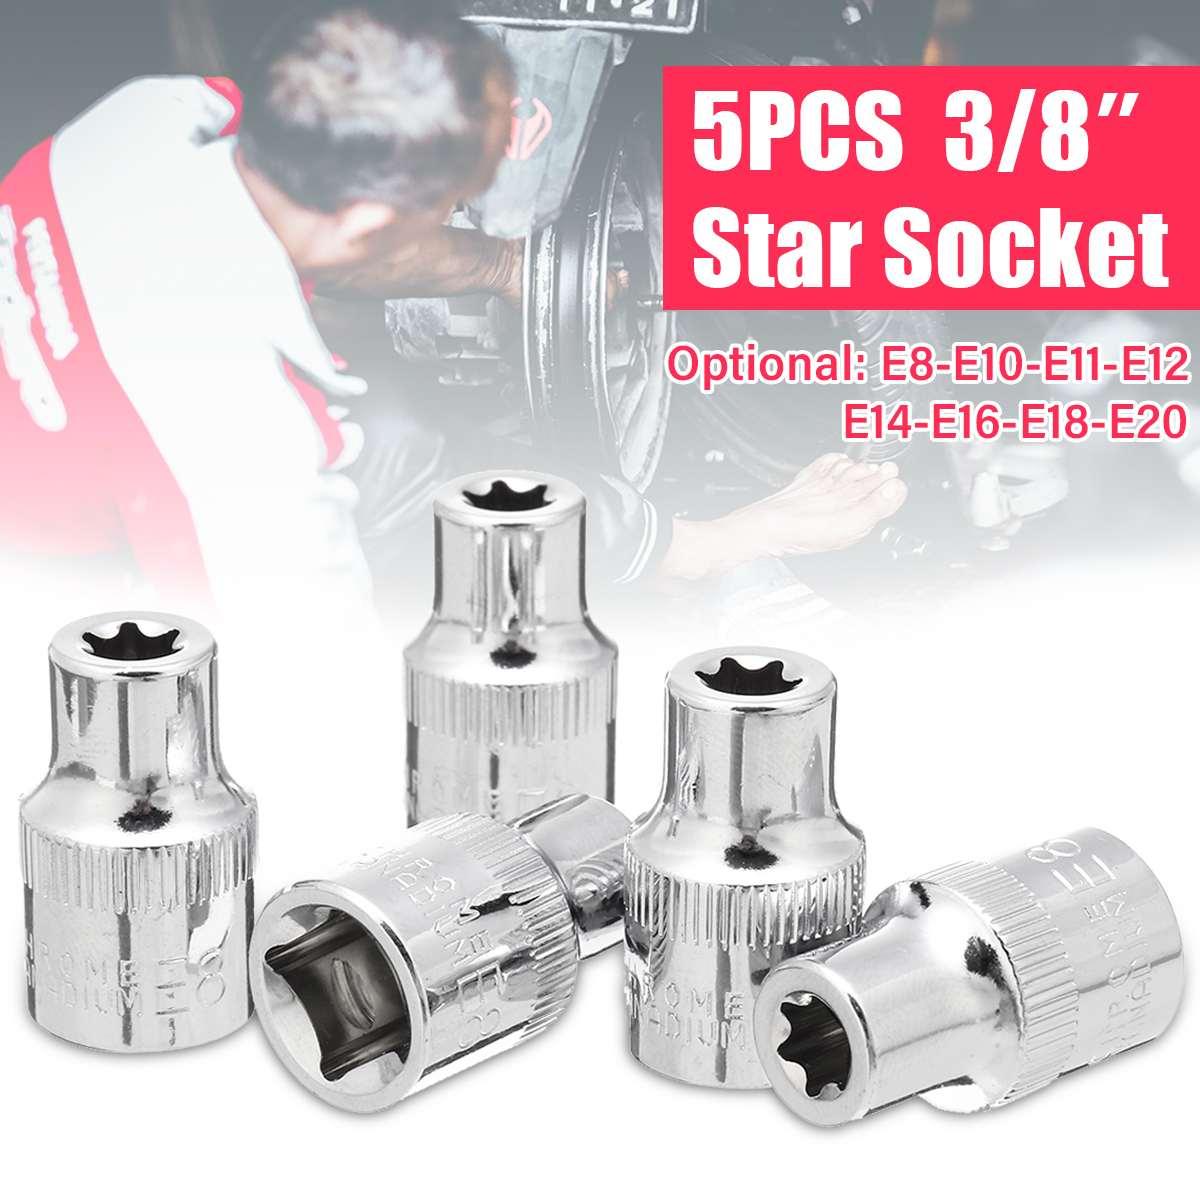 5PCS 3/8'' Torx Star Sockets Set E-shaped Casing Hexagon Wrench Head E8 E10 E11 E12 E14 E16 E18 E20 Metric Car Auto Repair Tools